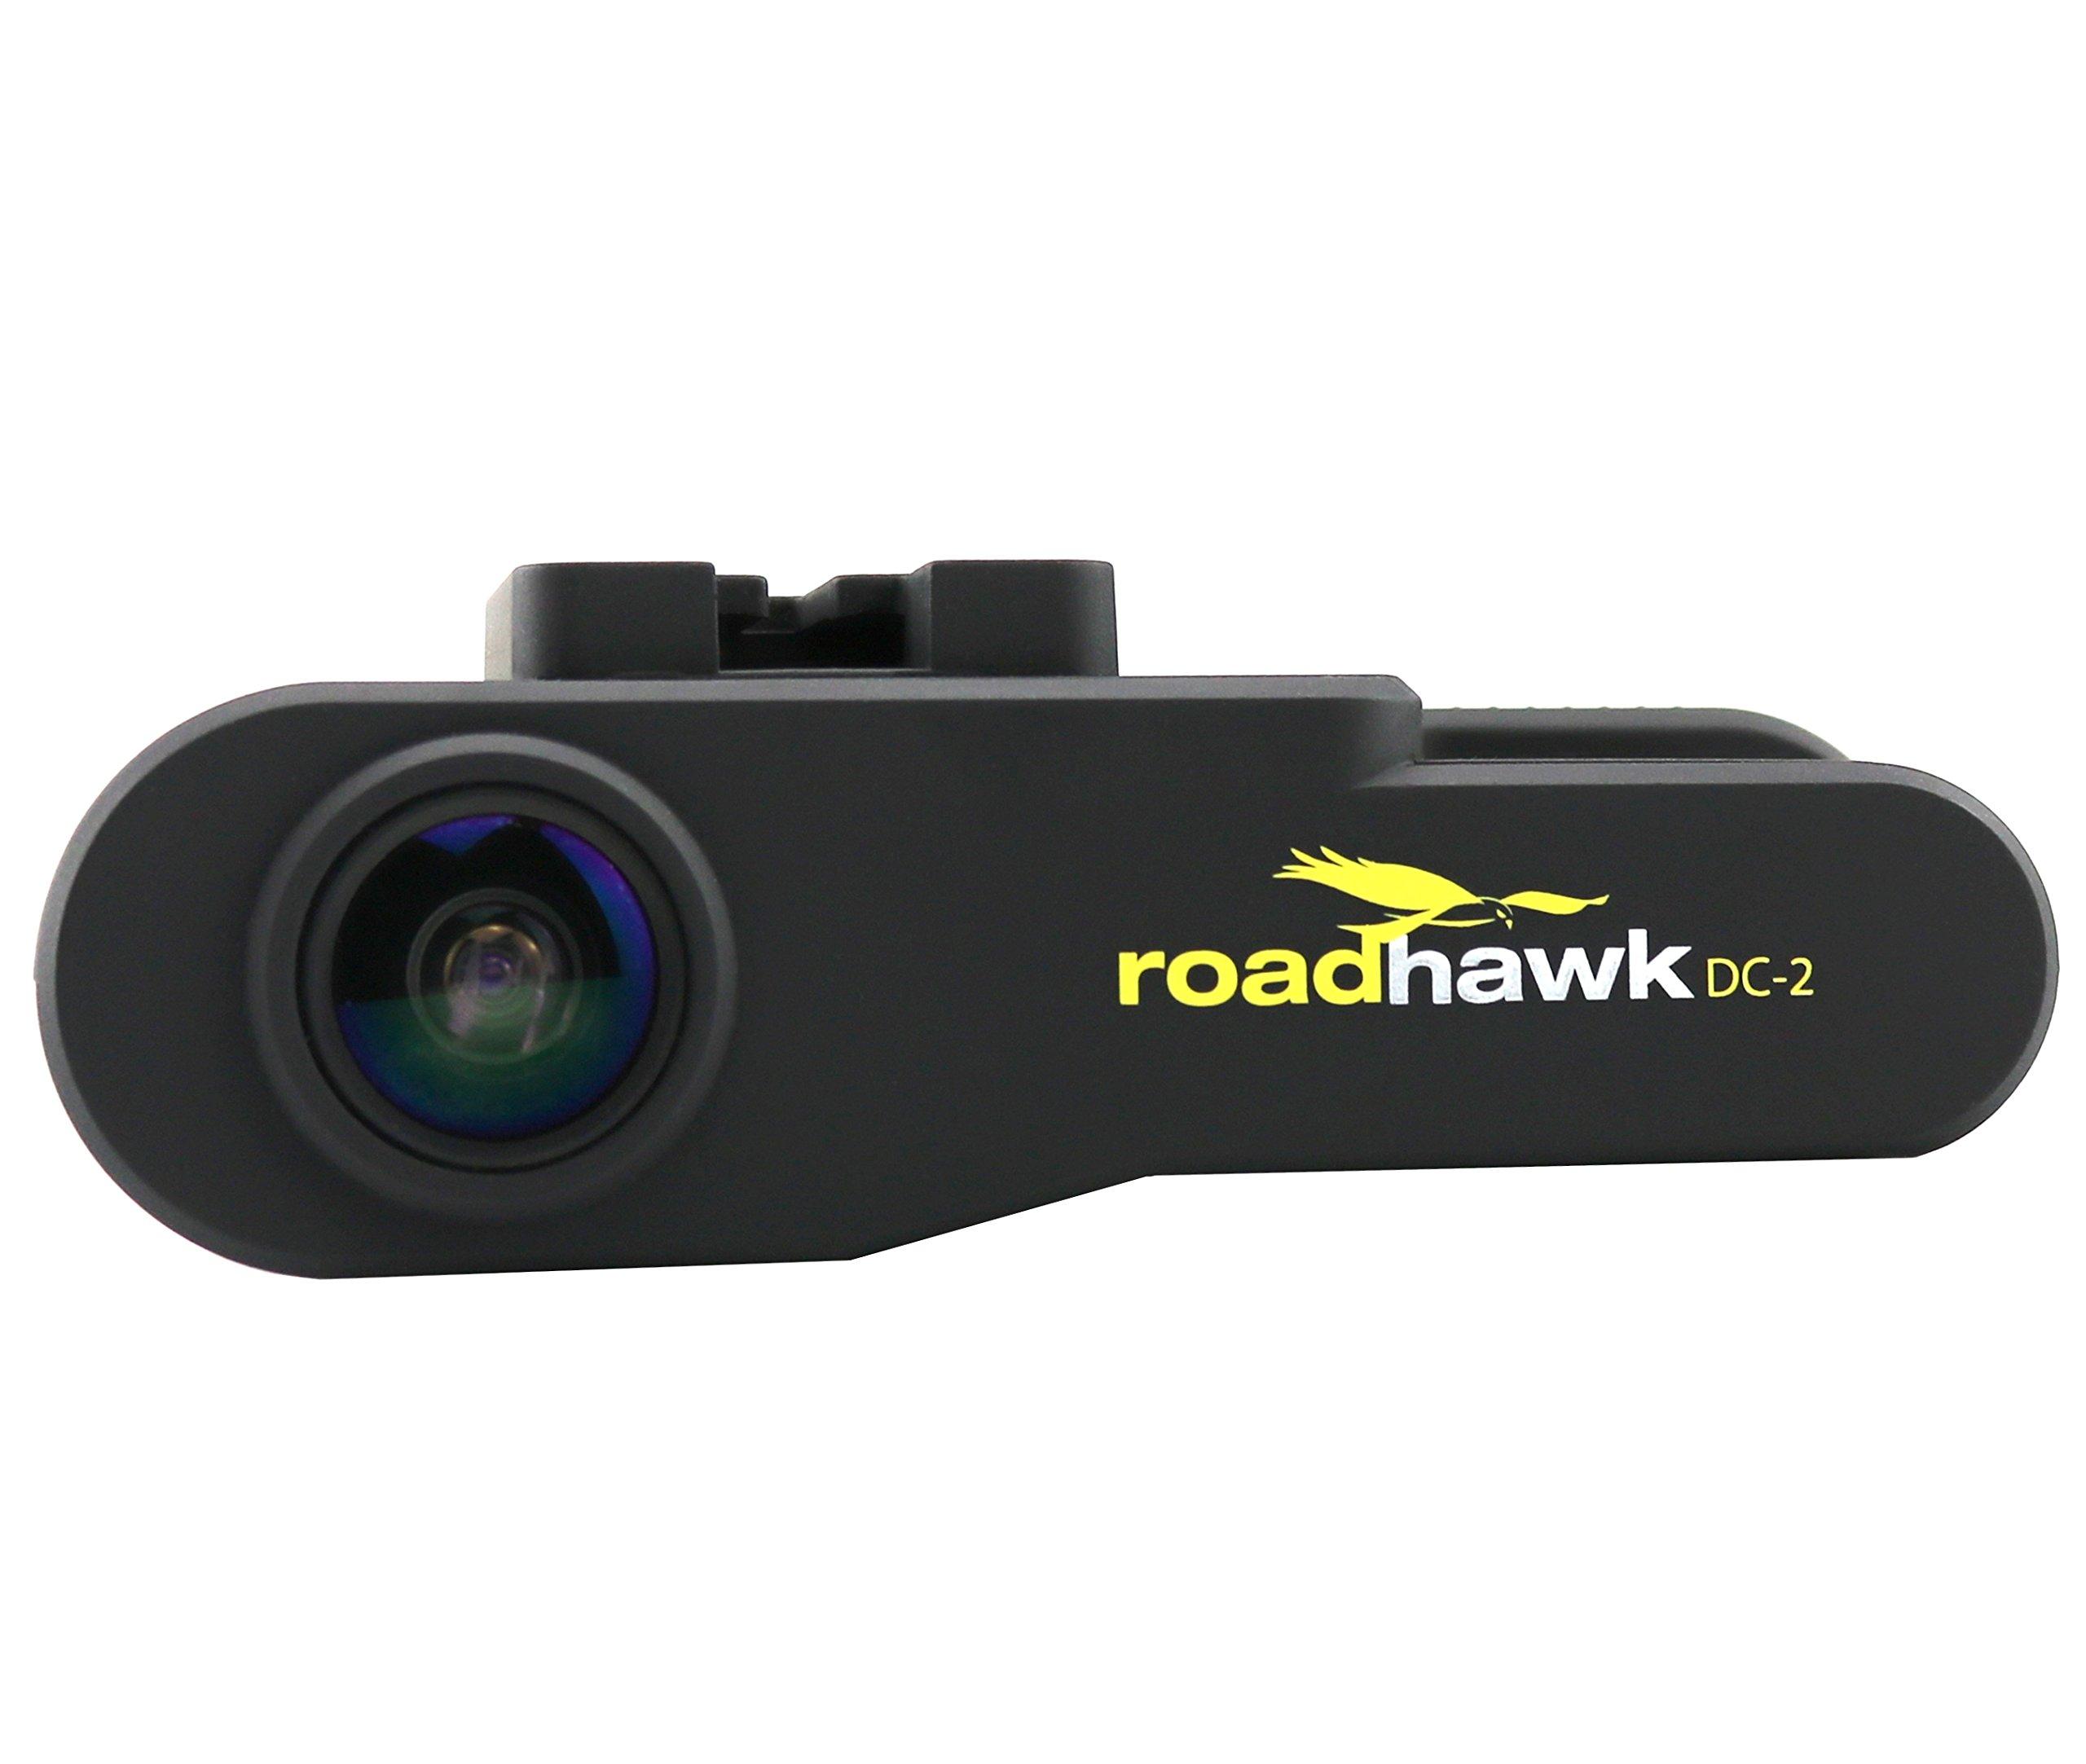 RoadHawk DC-2 Dash Cam 1080p HD In Car Camera | IT-Shield